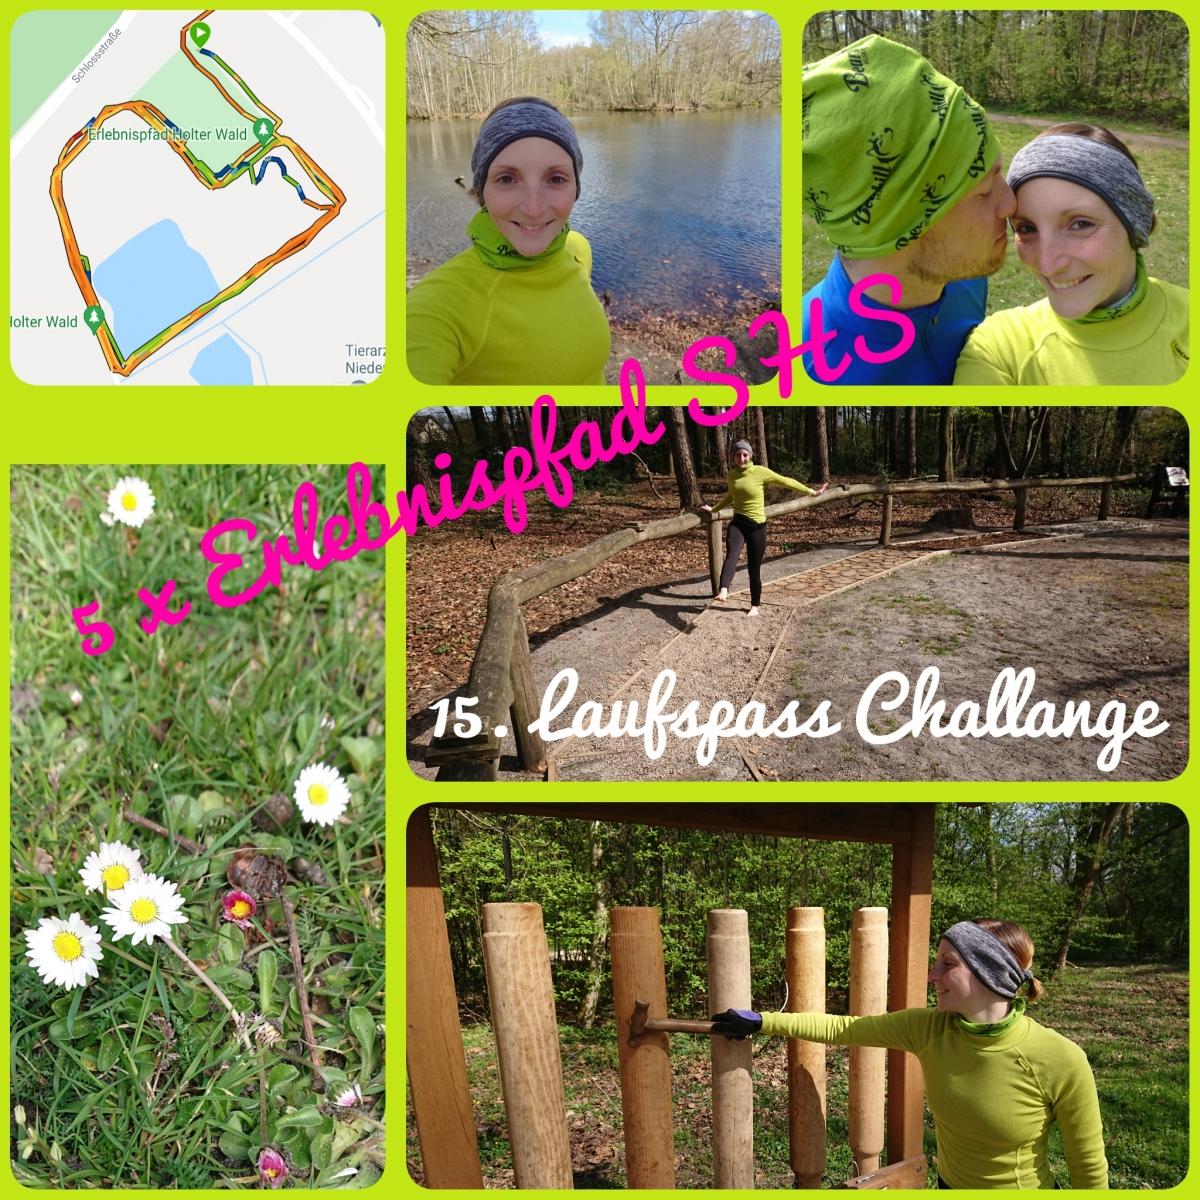 Zipter-Kristina-15-Challenge-Erlebnispfad-VFZd7